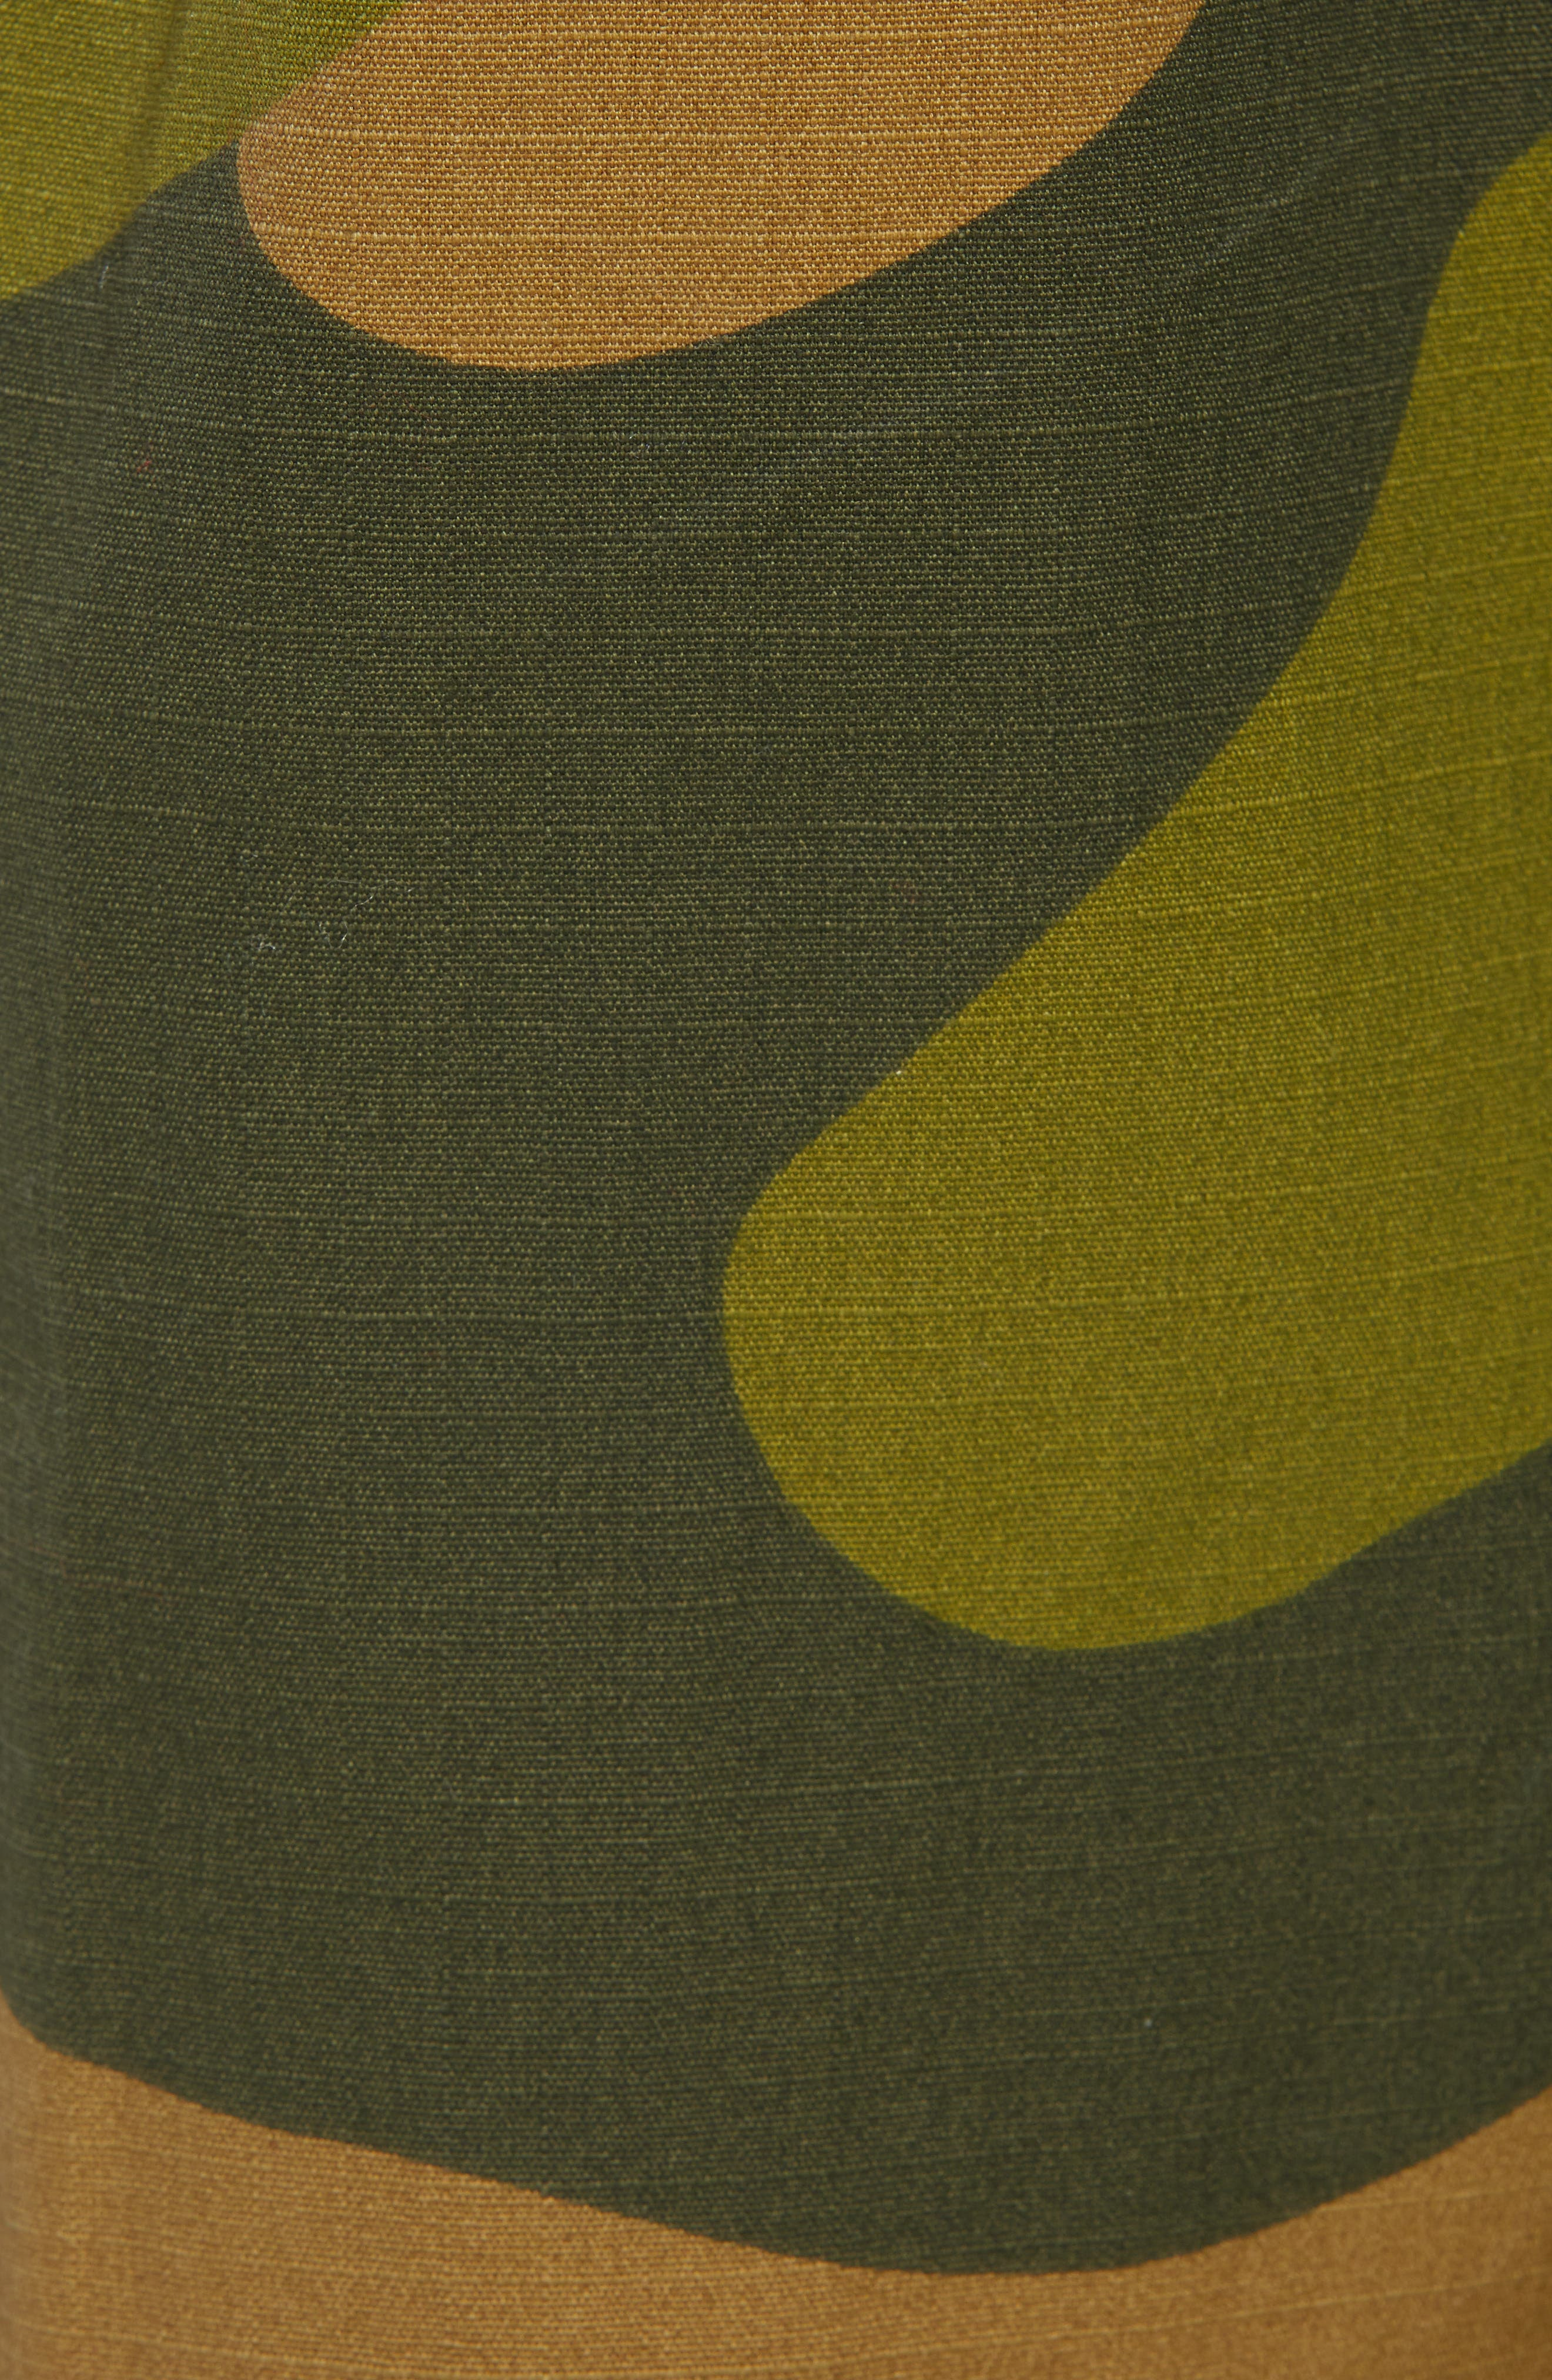 Fubar Relaxed Fit Cargo Pants,                             Alternate thumbnail 5, color,                             305